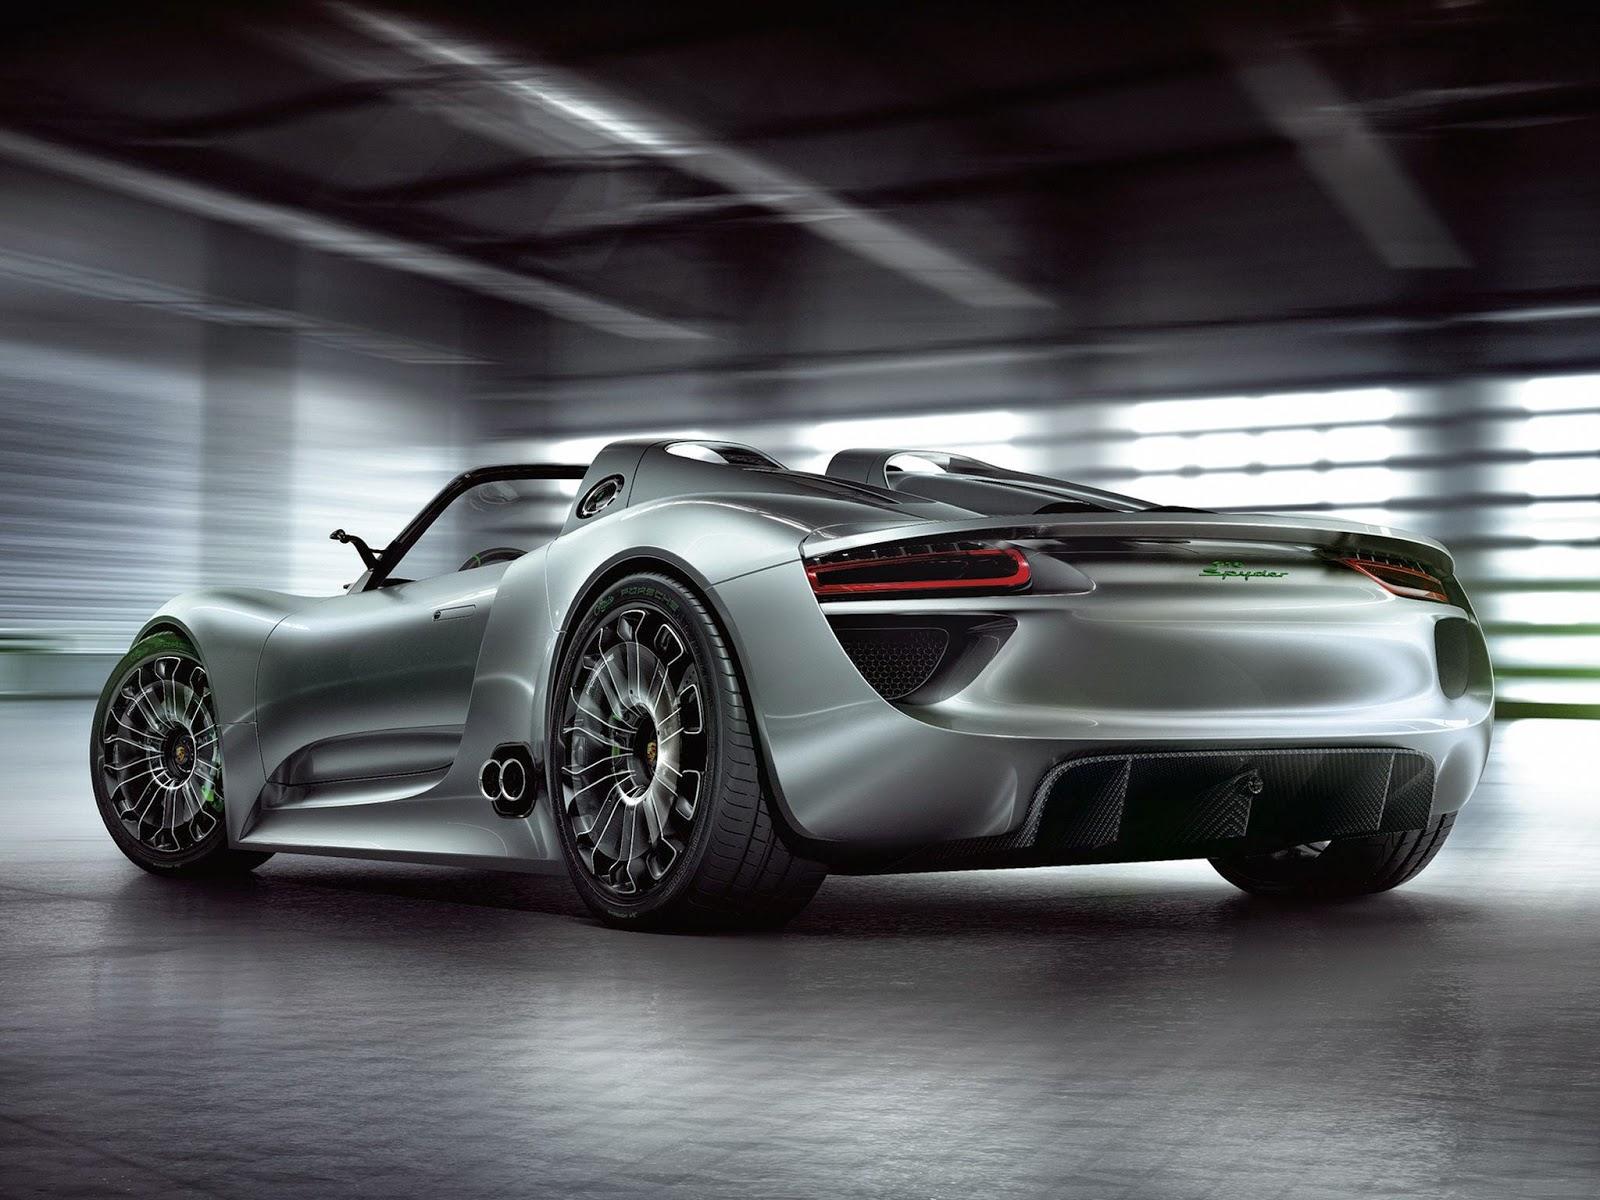 wallpapers car sport desktop    top newest